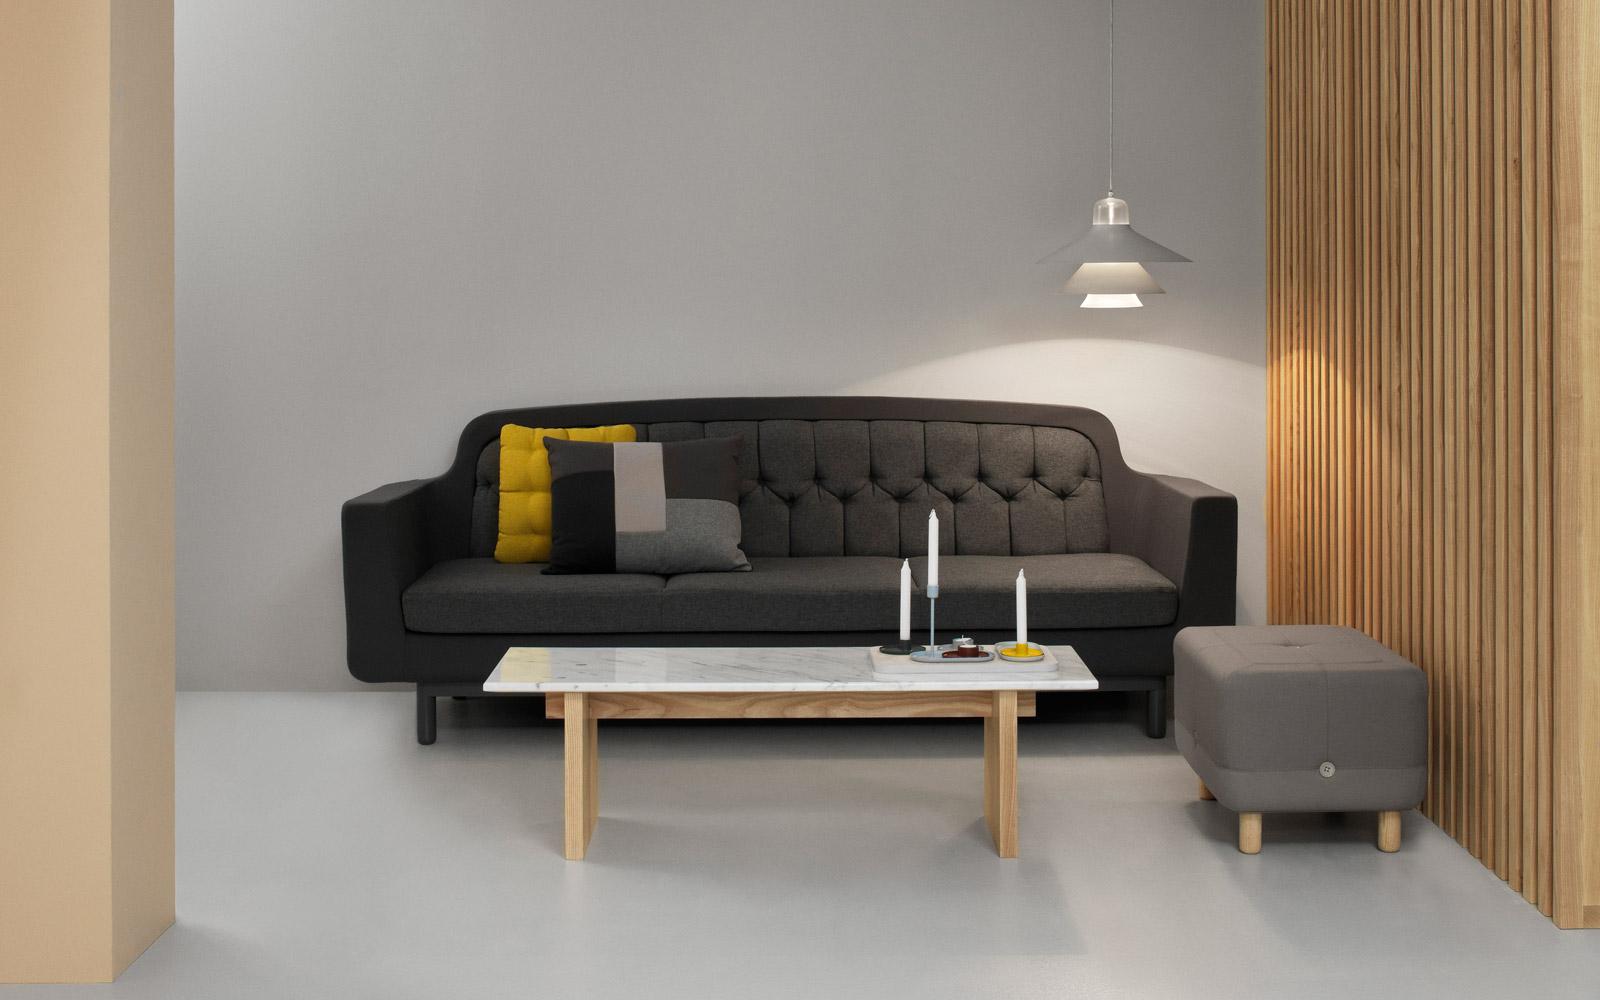 Brick Cushion Red Modern Geometrical Patchwork Design